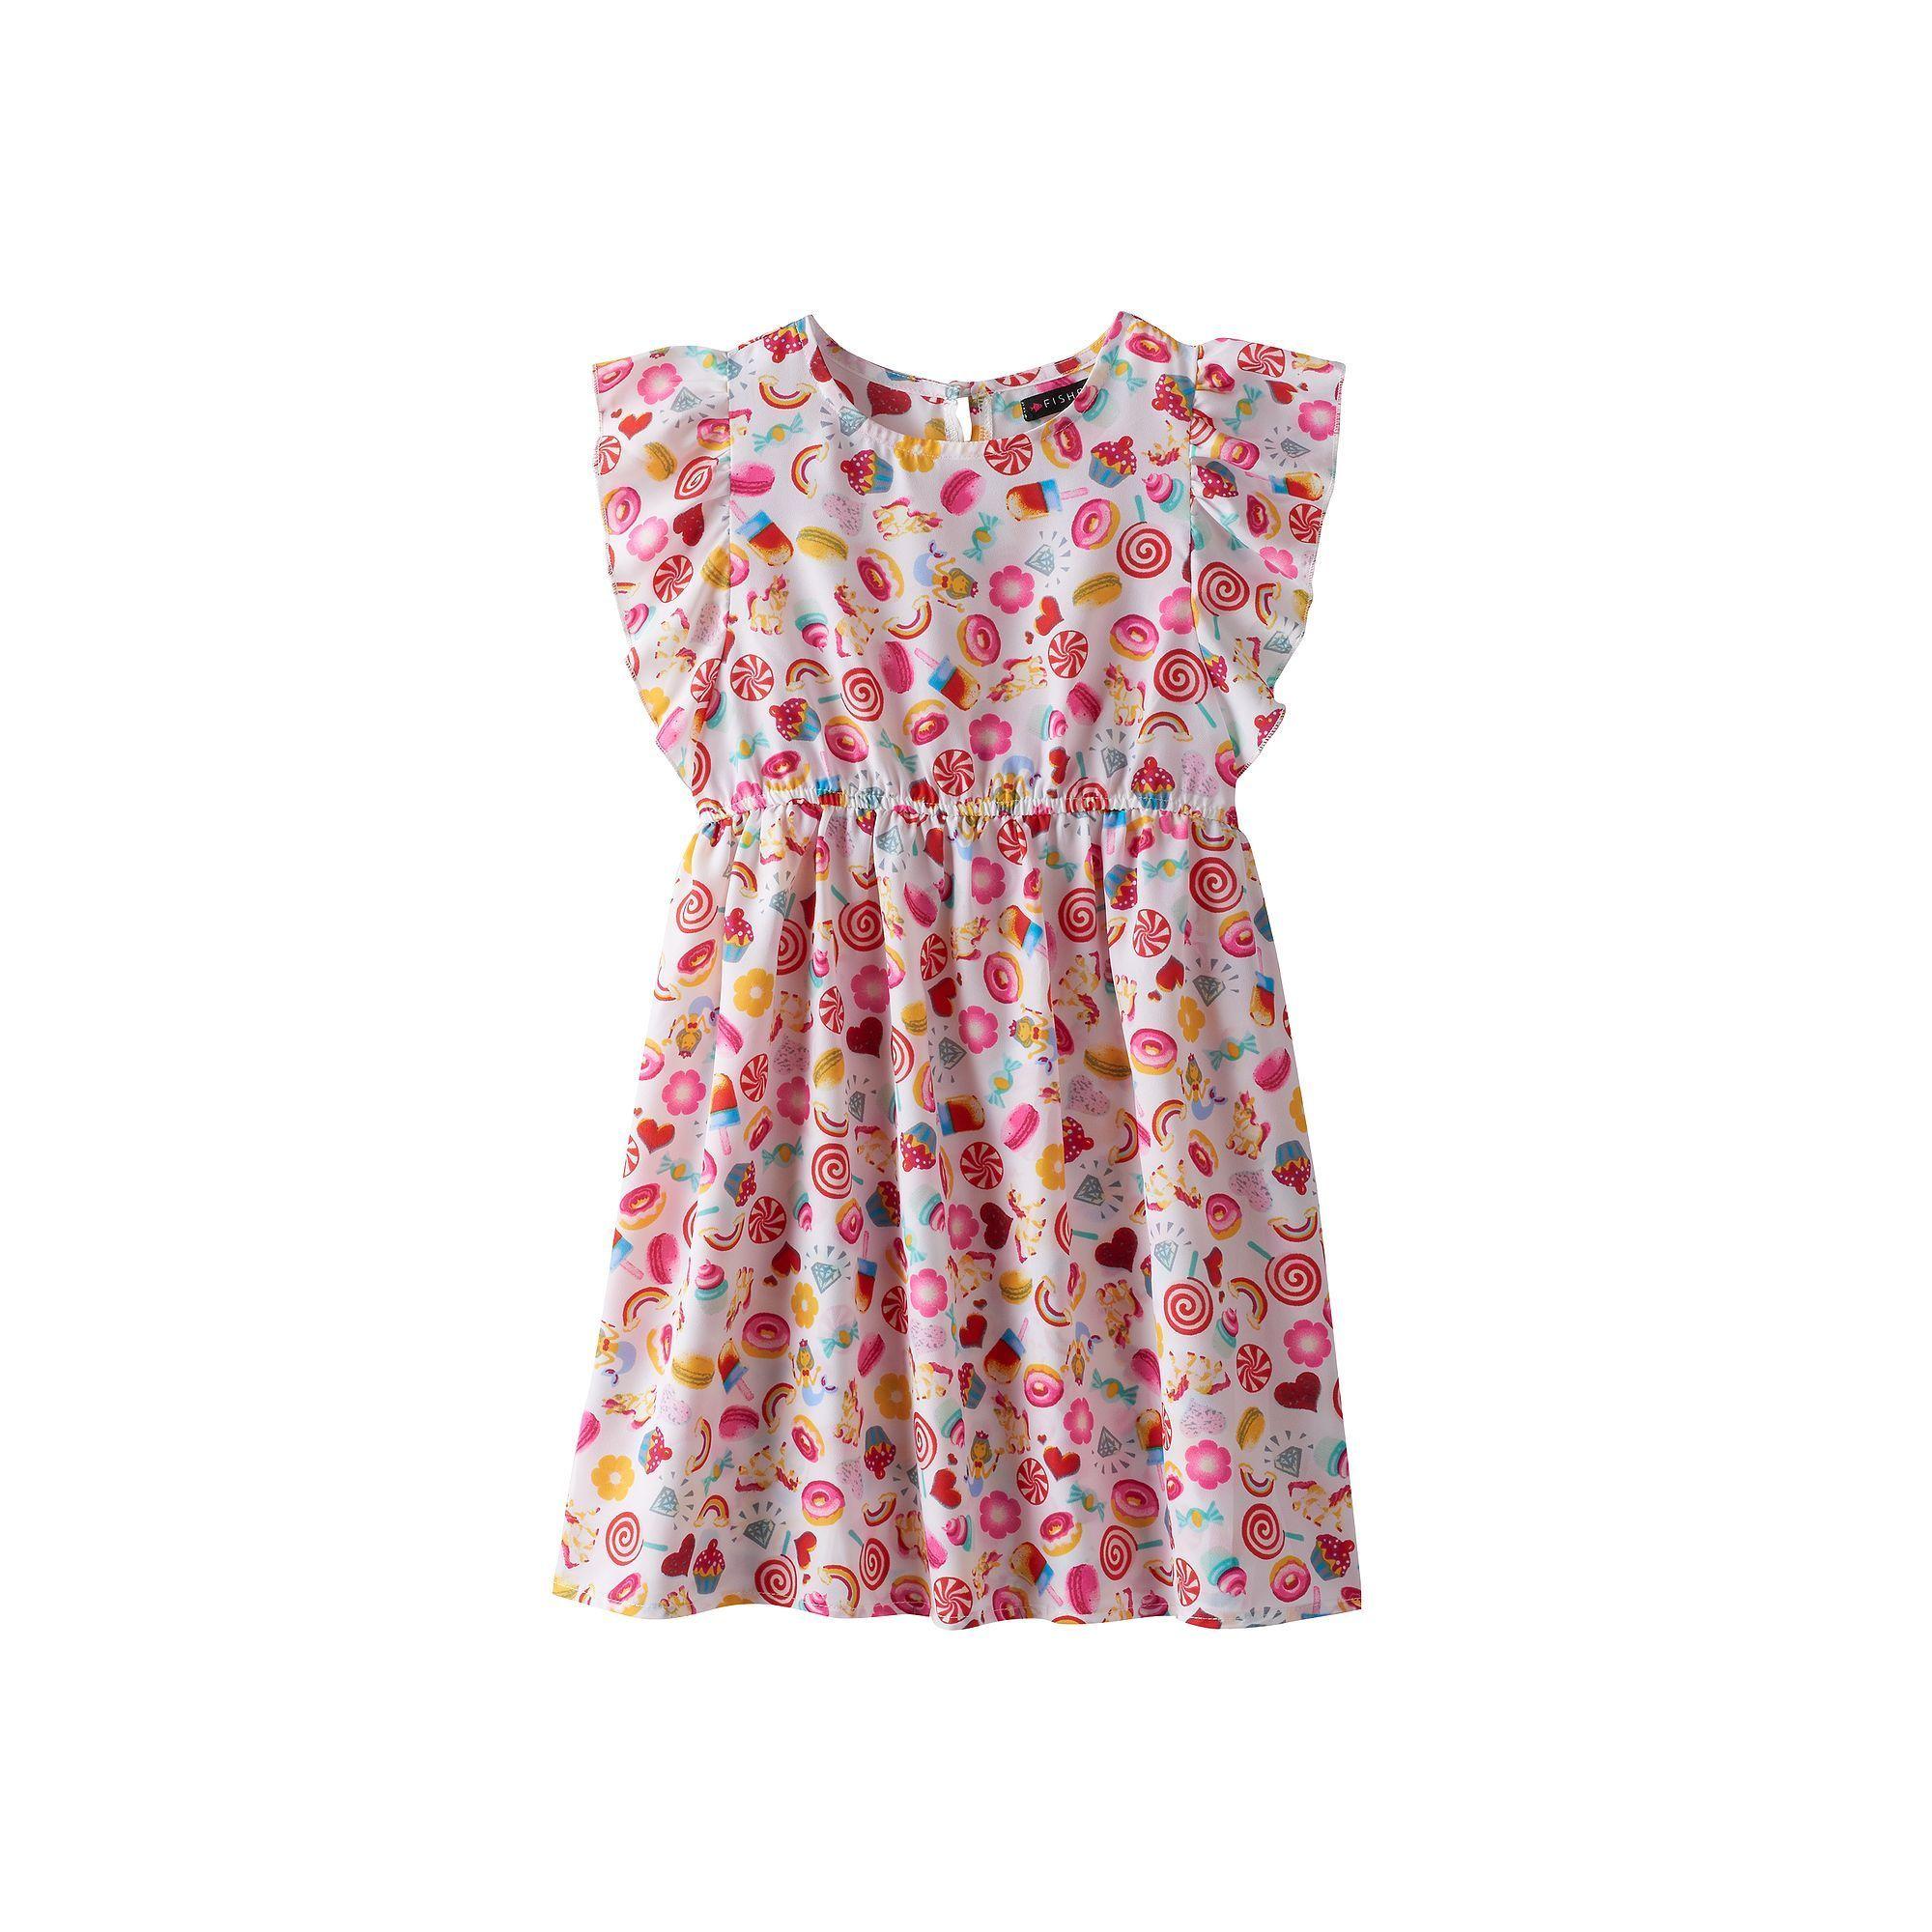 Girls 4-6x Emerald Sundae Emoji Flutter Sleeve Dress, Size: 4, White Oth